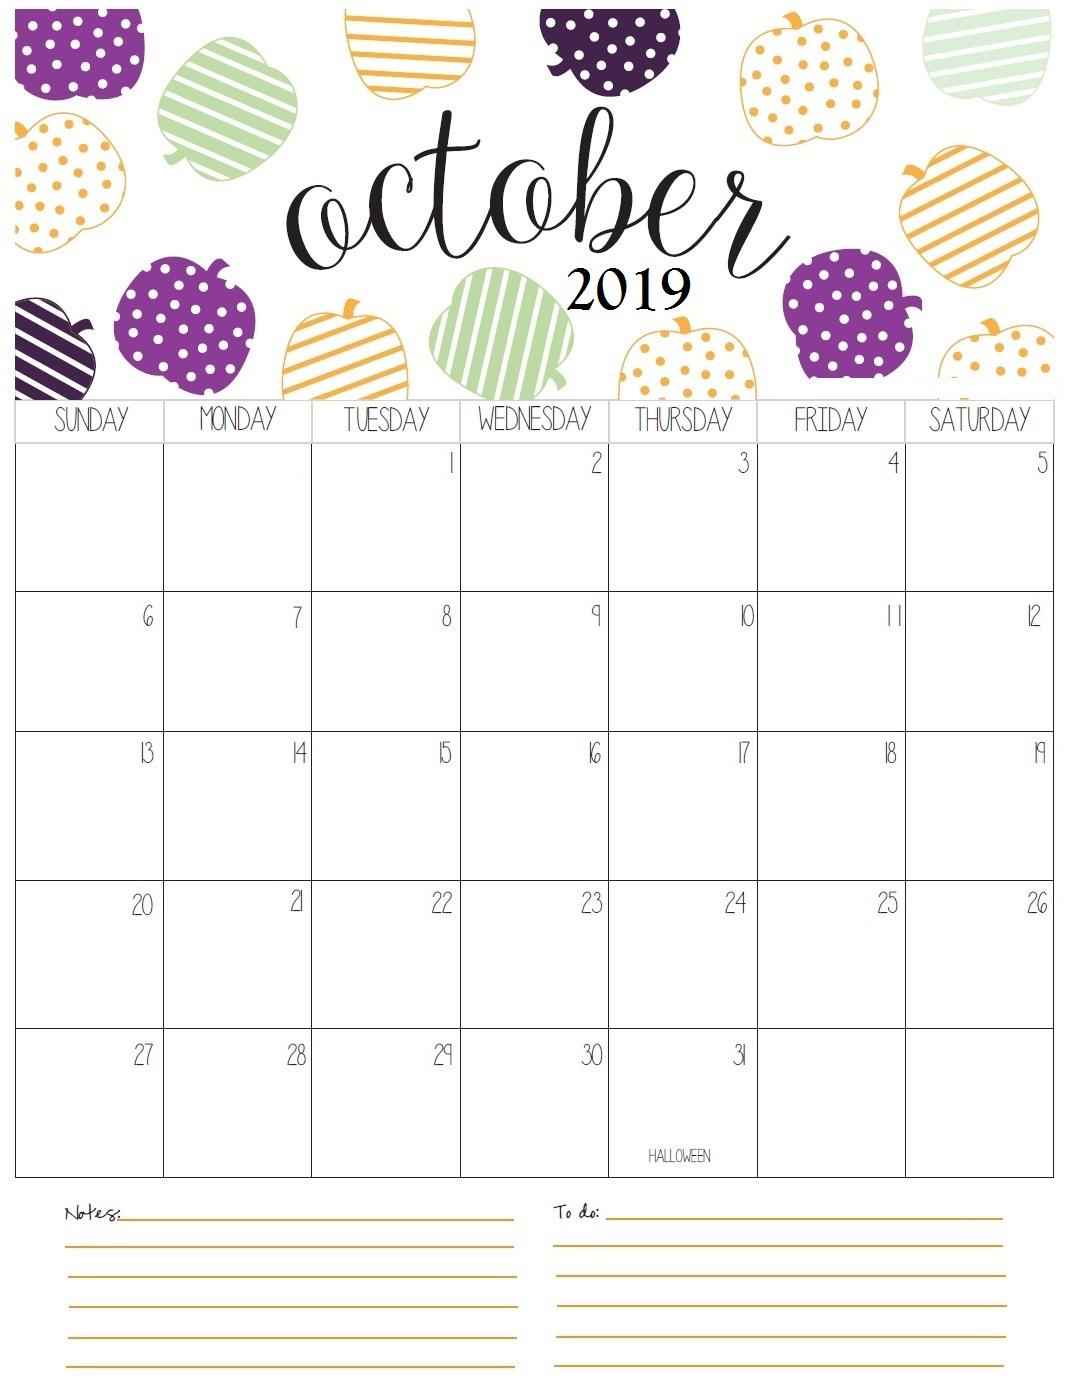 October 2019 Calendar Floral